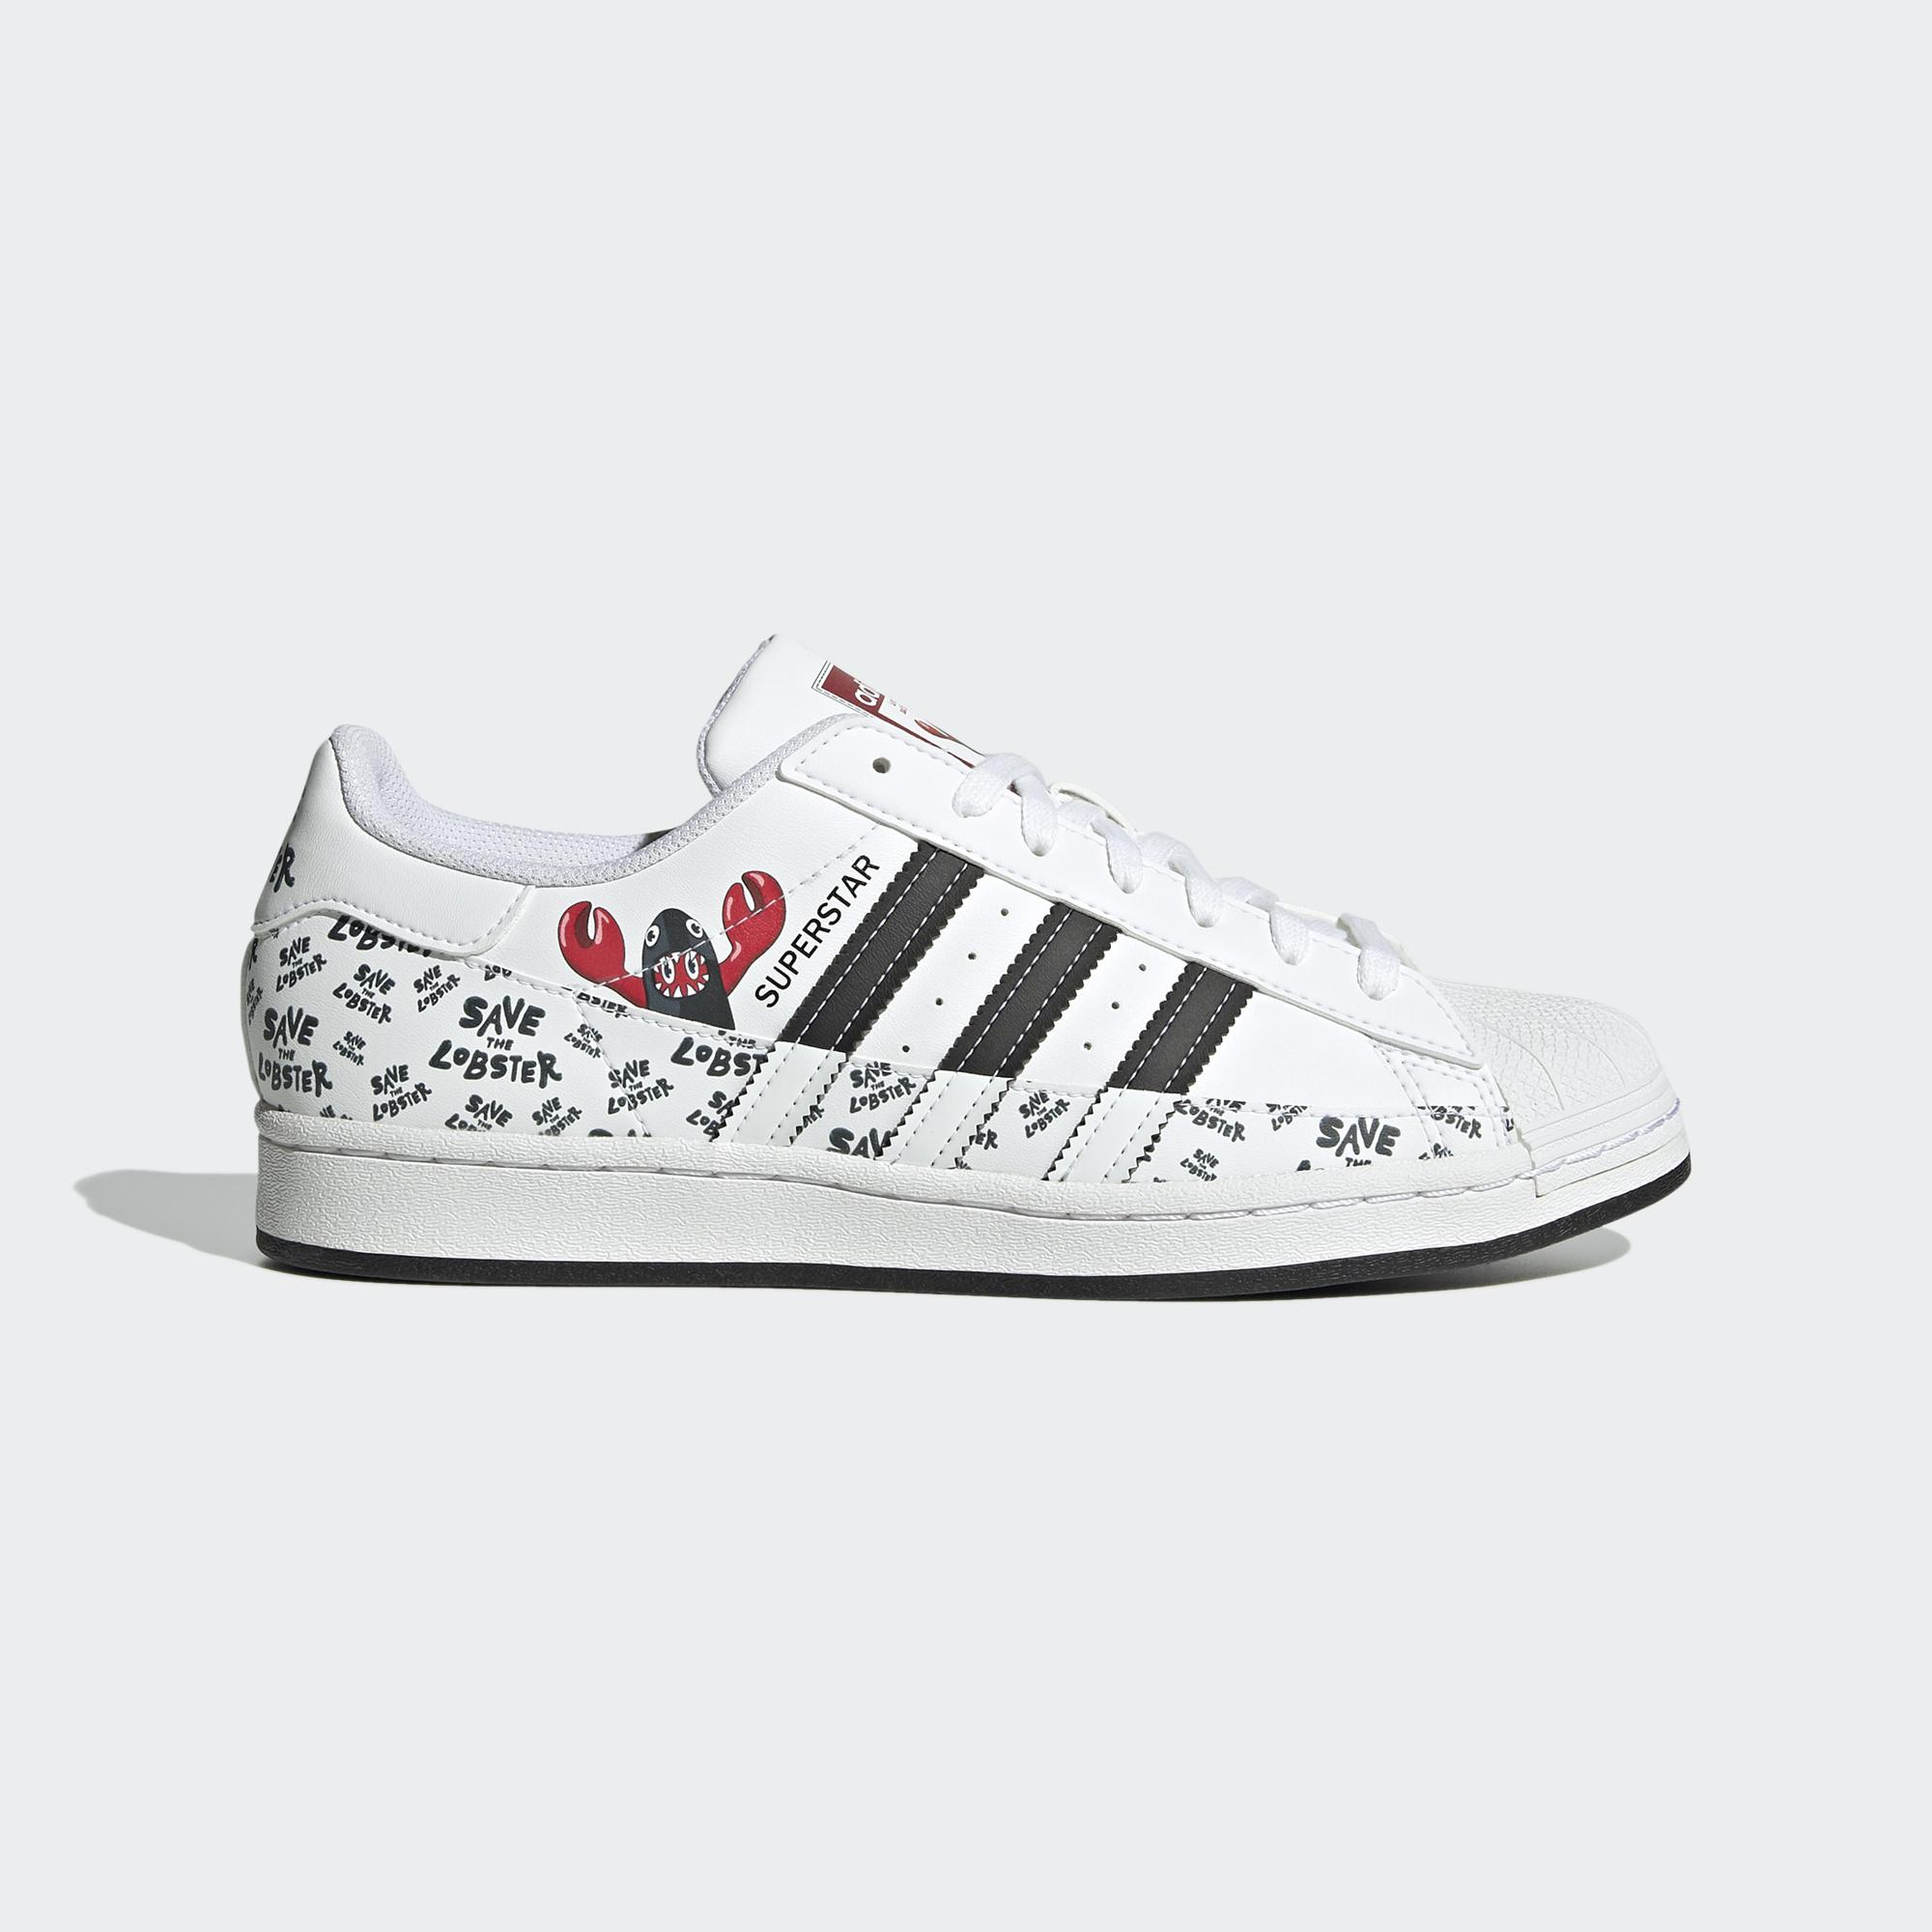 Philip Colbert x Superstar 經典鞋